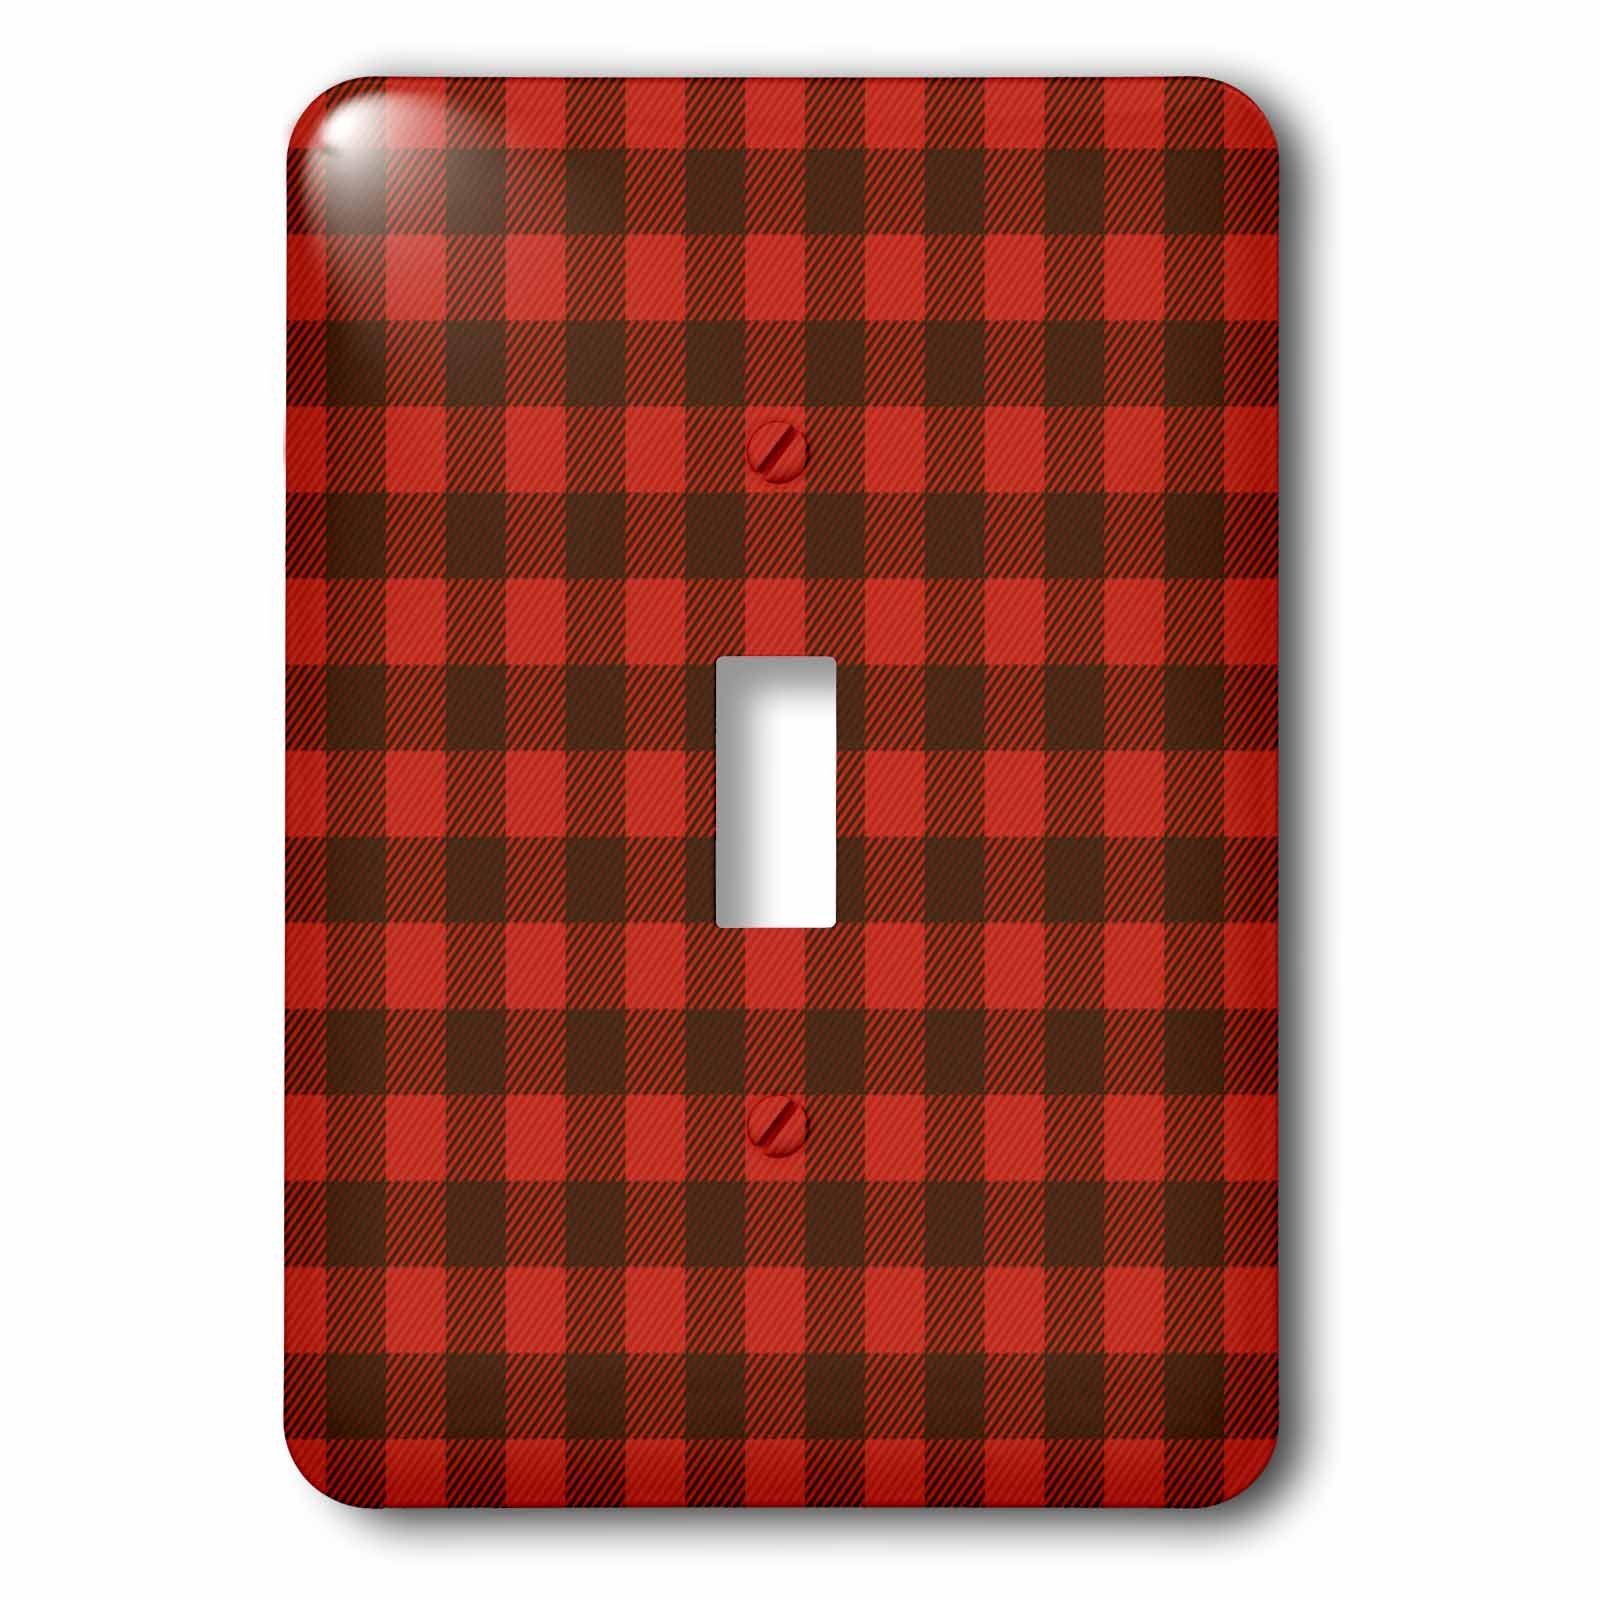 3dRose (lsp_266106_1) Single Toggle Switch (1) Buffalo Plaid